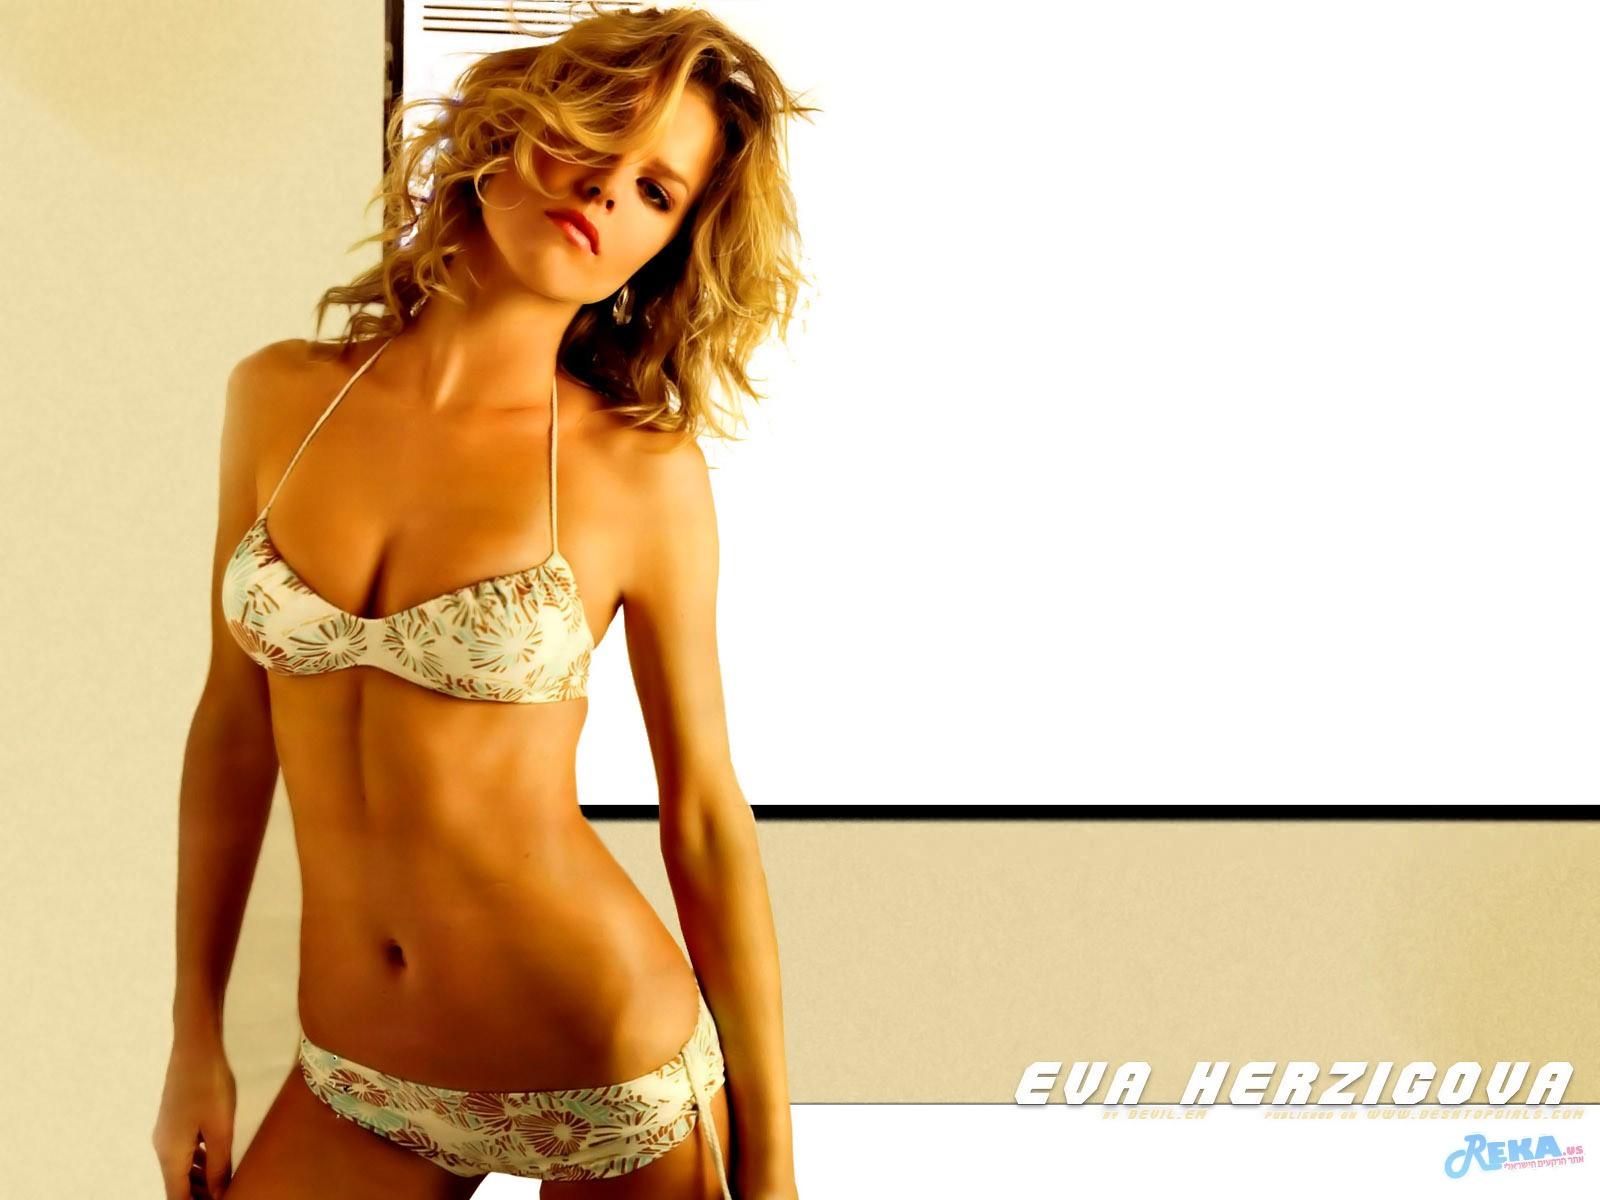 Eva_Herzigova_410200735044PM937.jpg